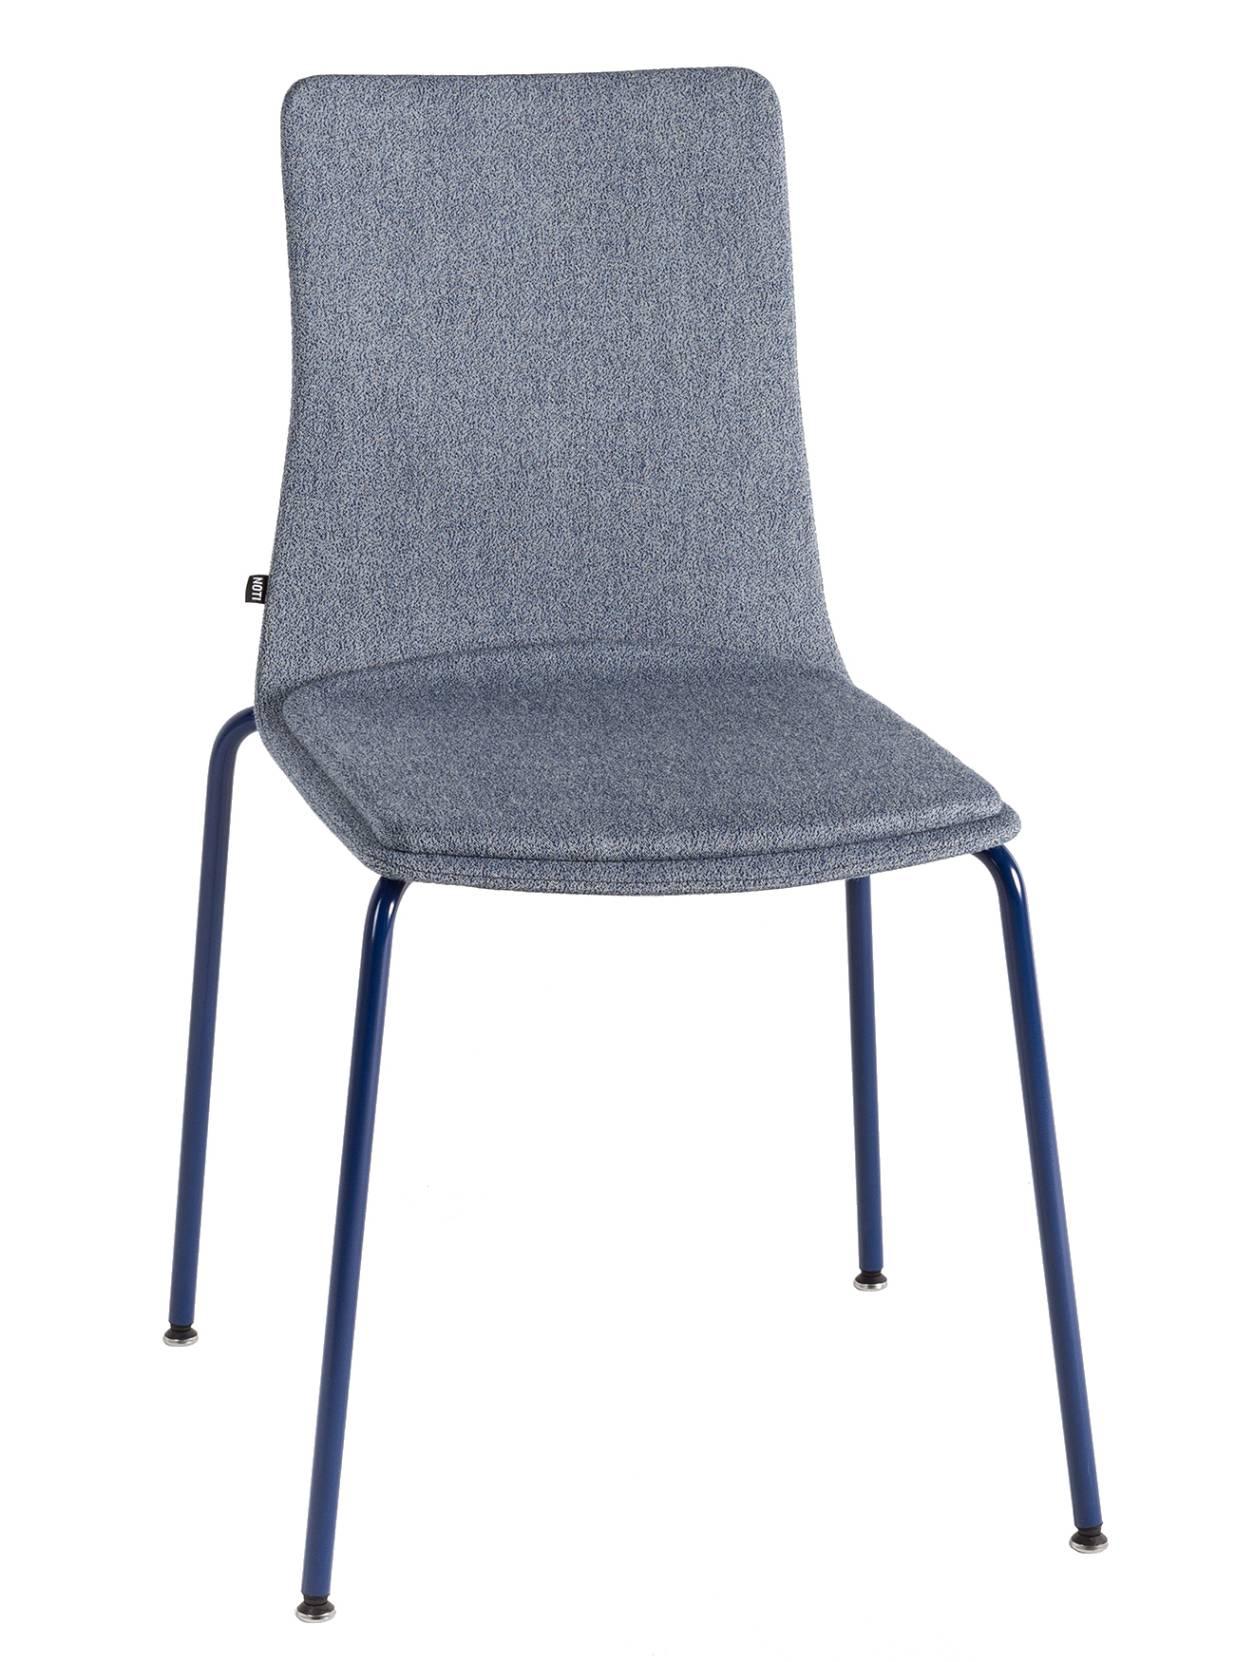 Linar Plus Vollpolster Stuhl mit Vierfußgestell